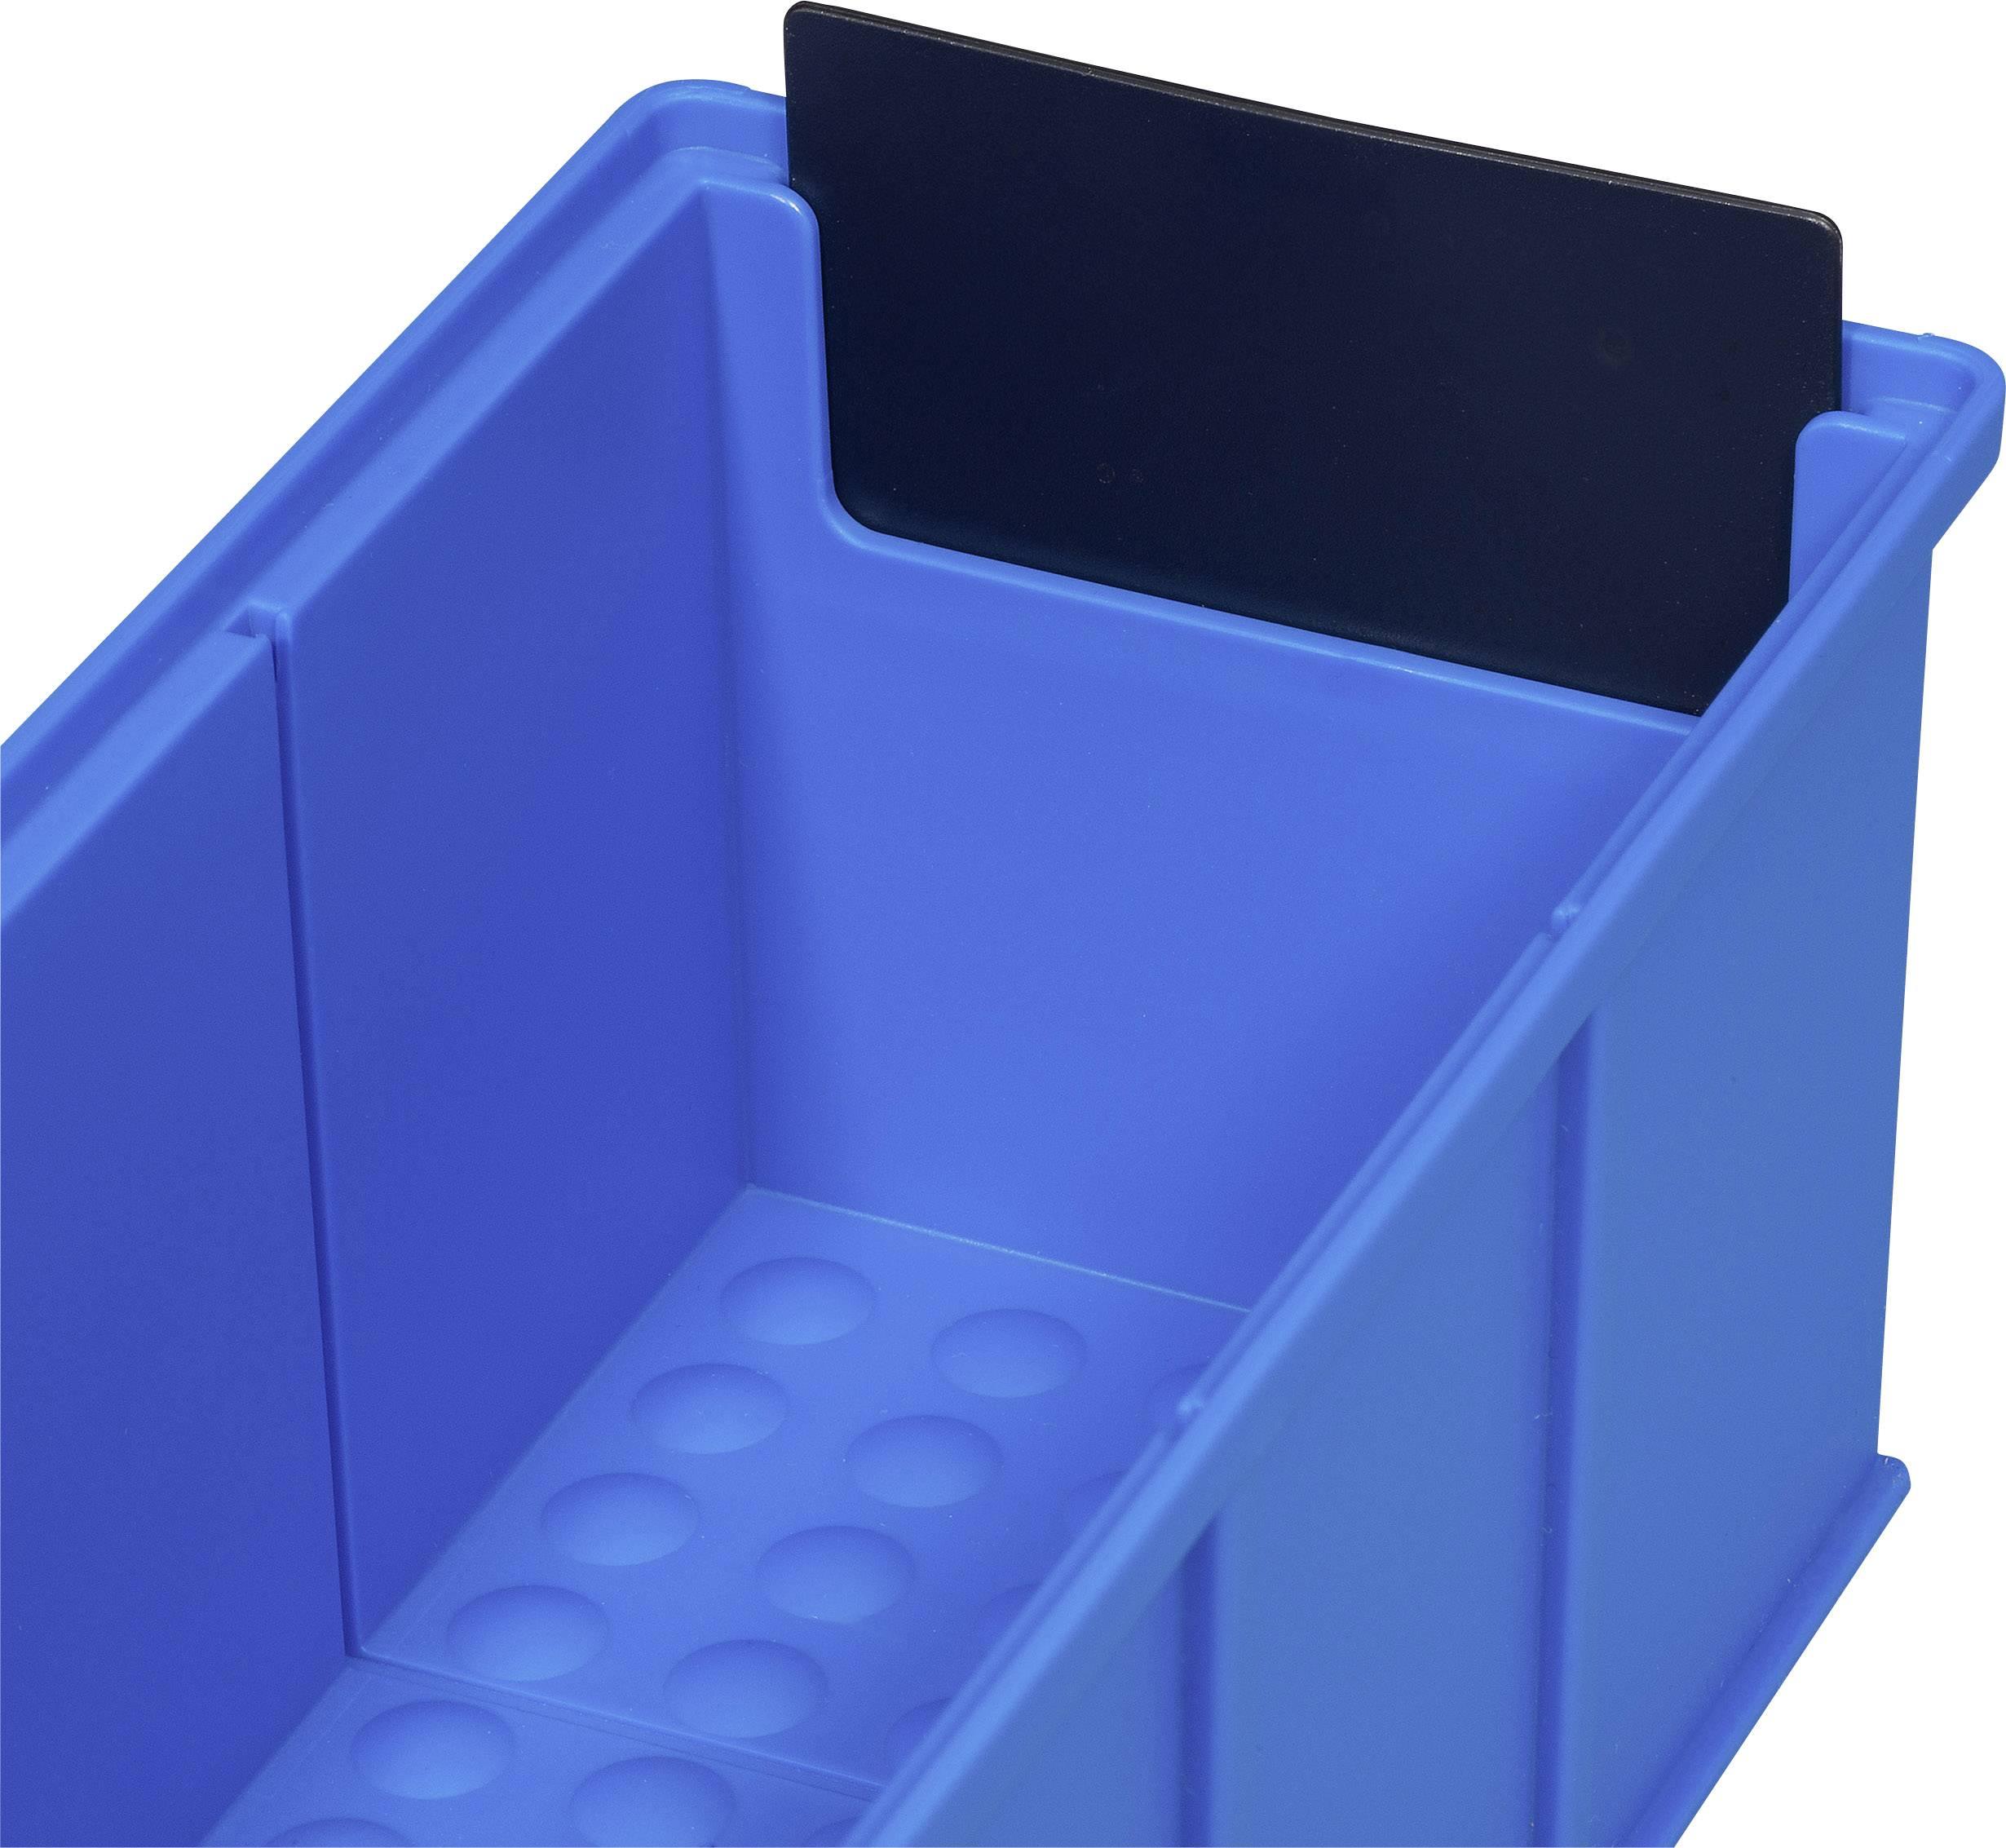 Allit Stapelsichtboxen ProfiPlus Box 2-10,2 x 16 x 7,5 cm gelb